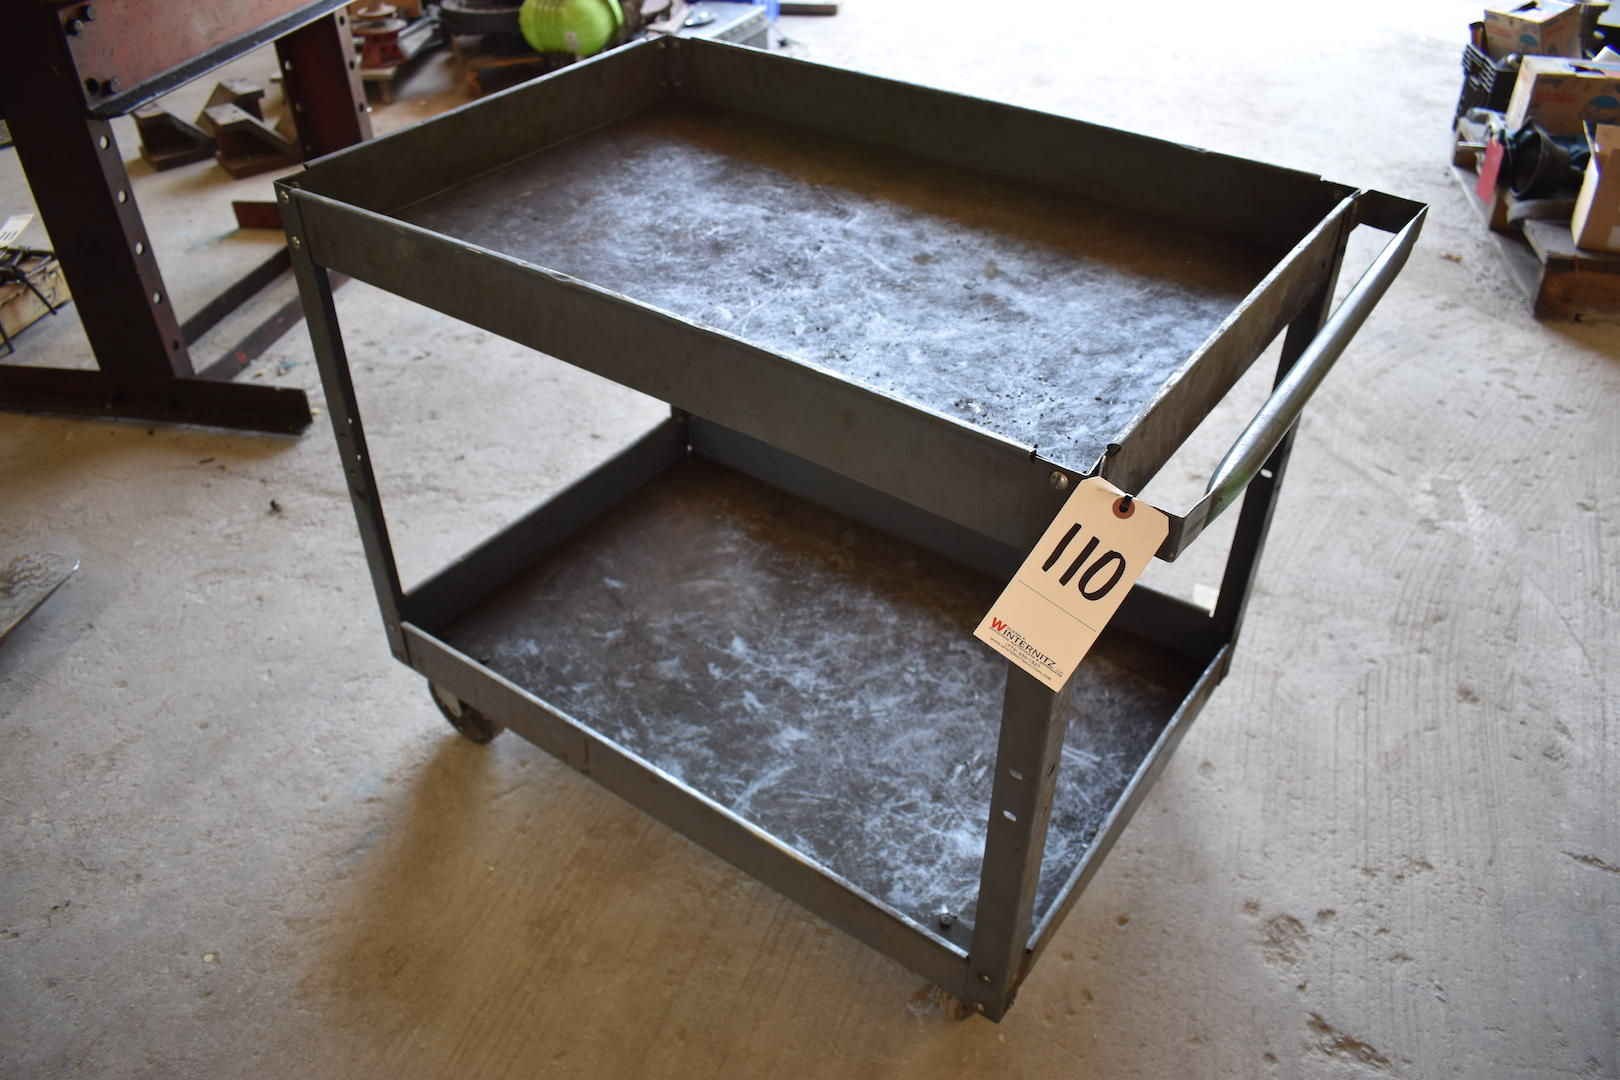 Lot 110 - Steel Shop Cart